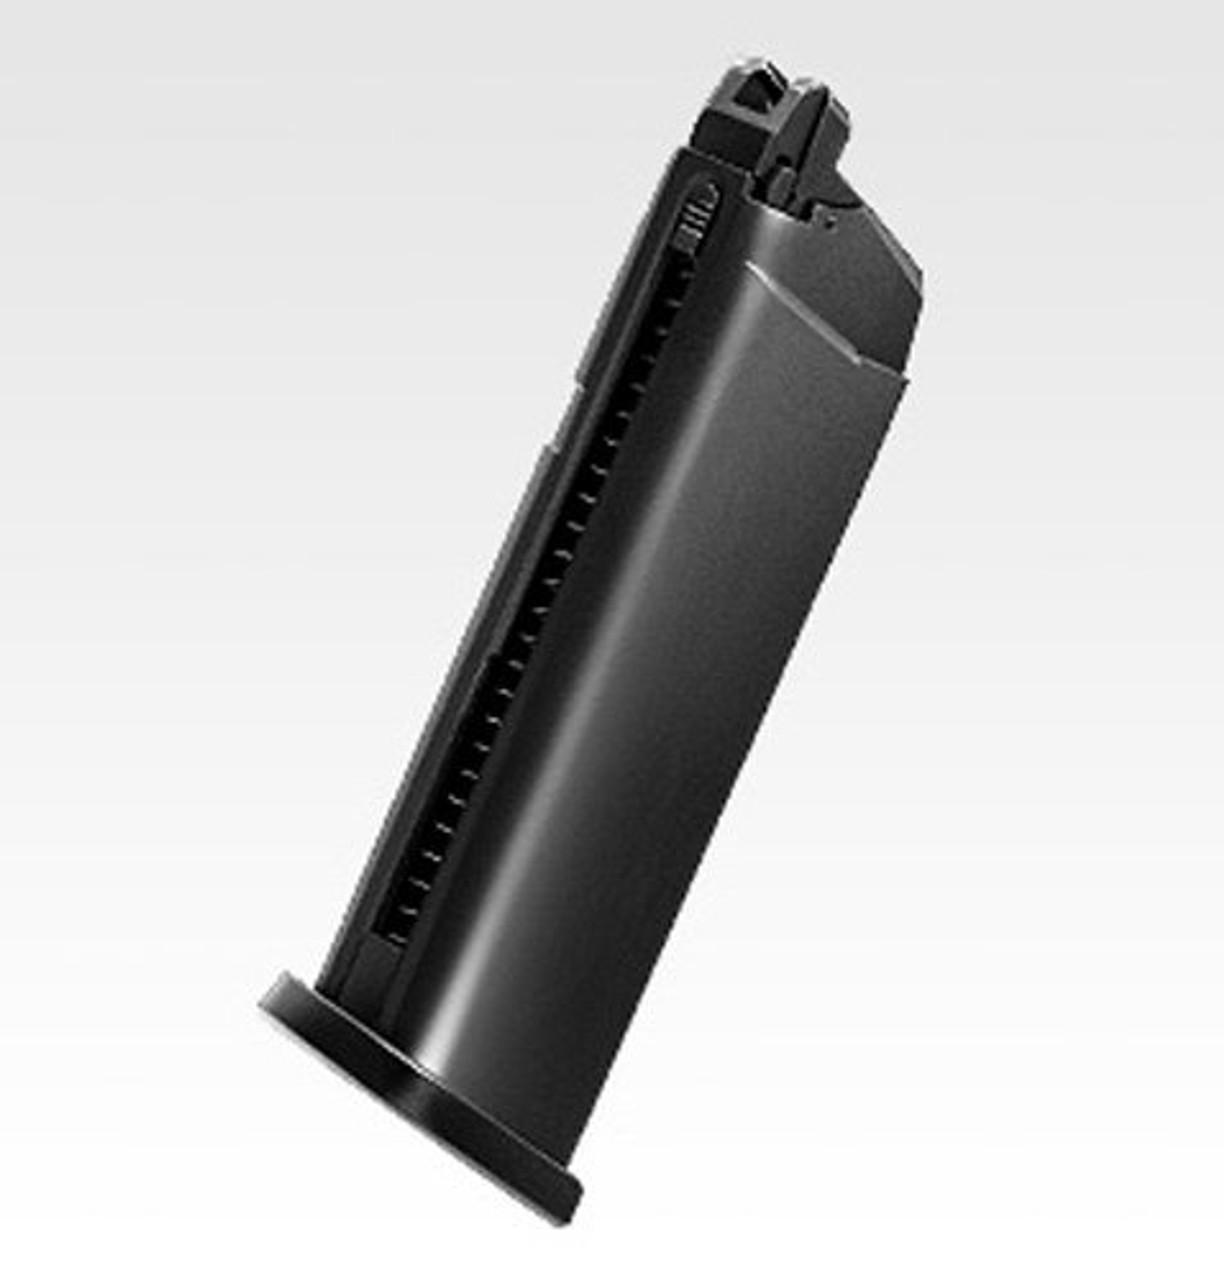 Magazine of Tokyo Marui No.44 Glock 18C Full Auto Gas blow back Airsoft Gun